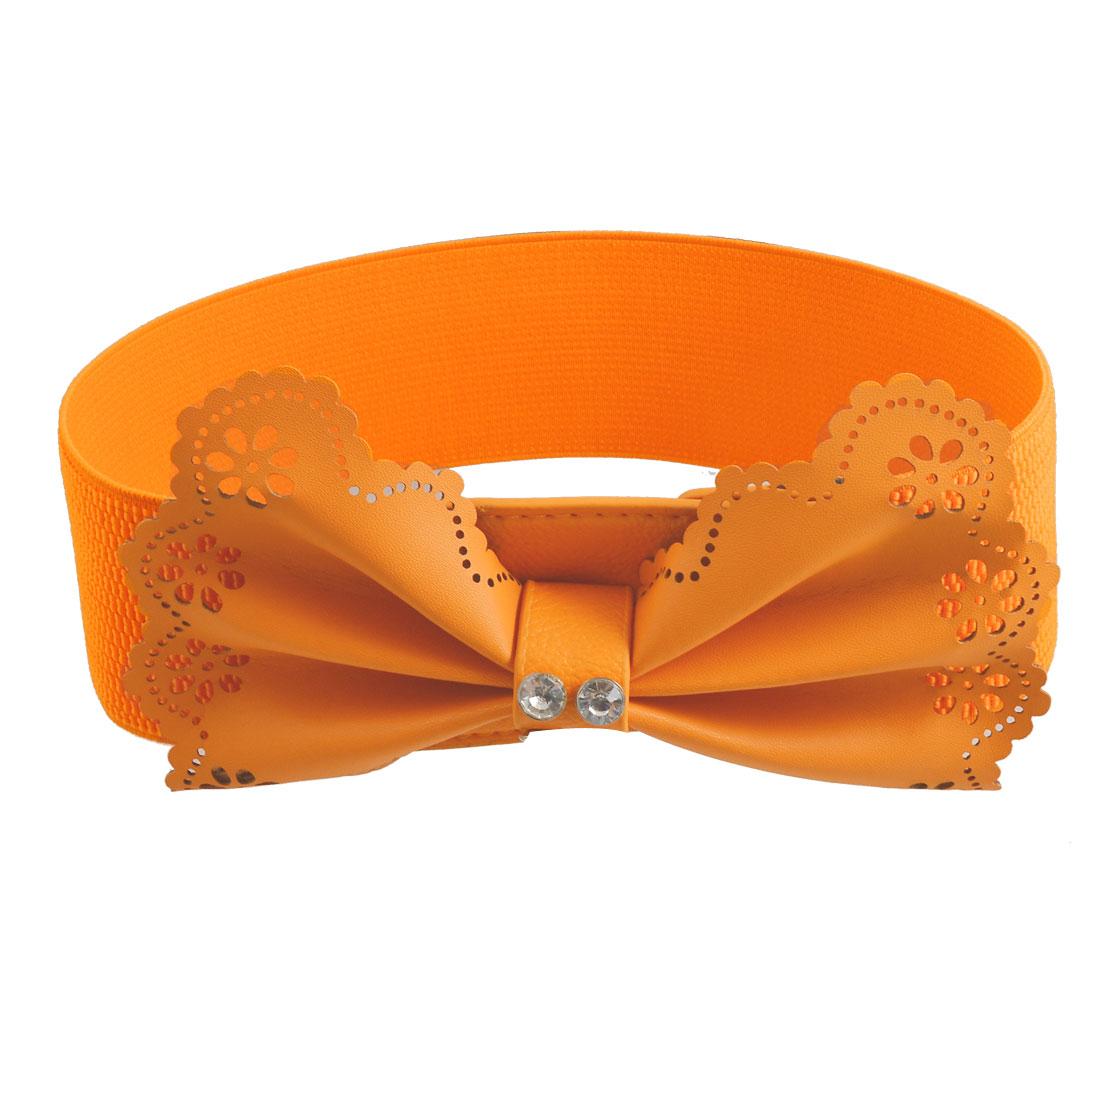 Lady Rhinestone Bowtie Decor Press Stud Button Waist Belt Waistband Orange Red